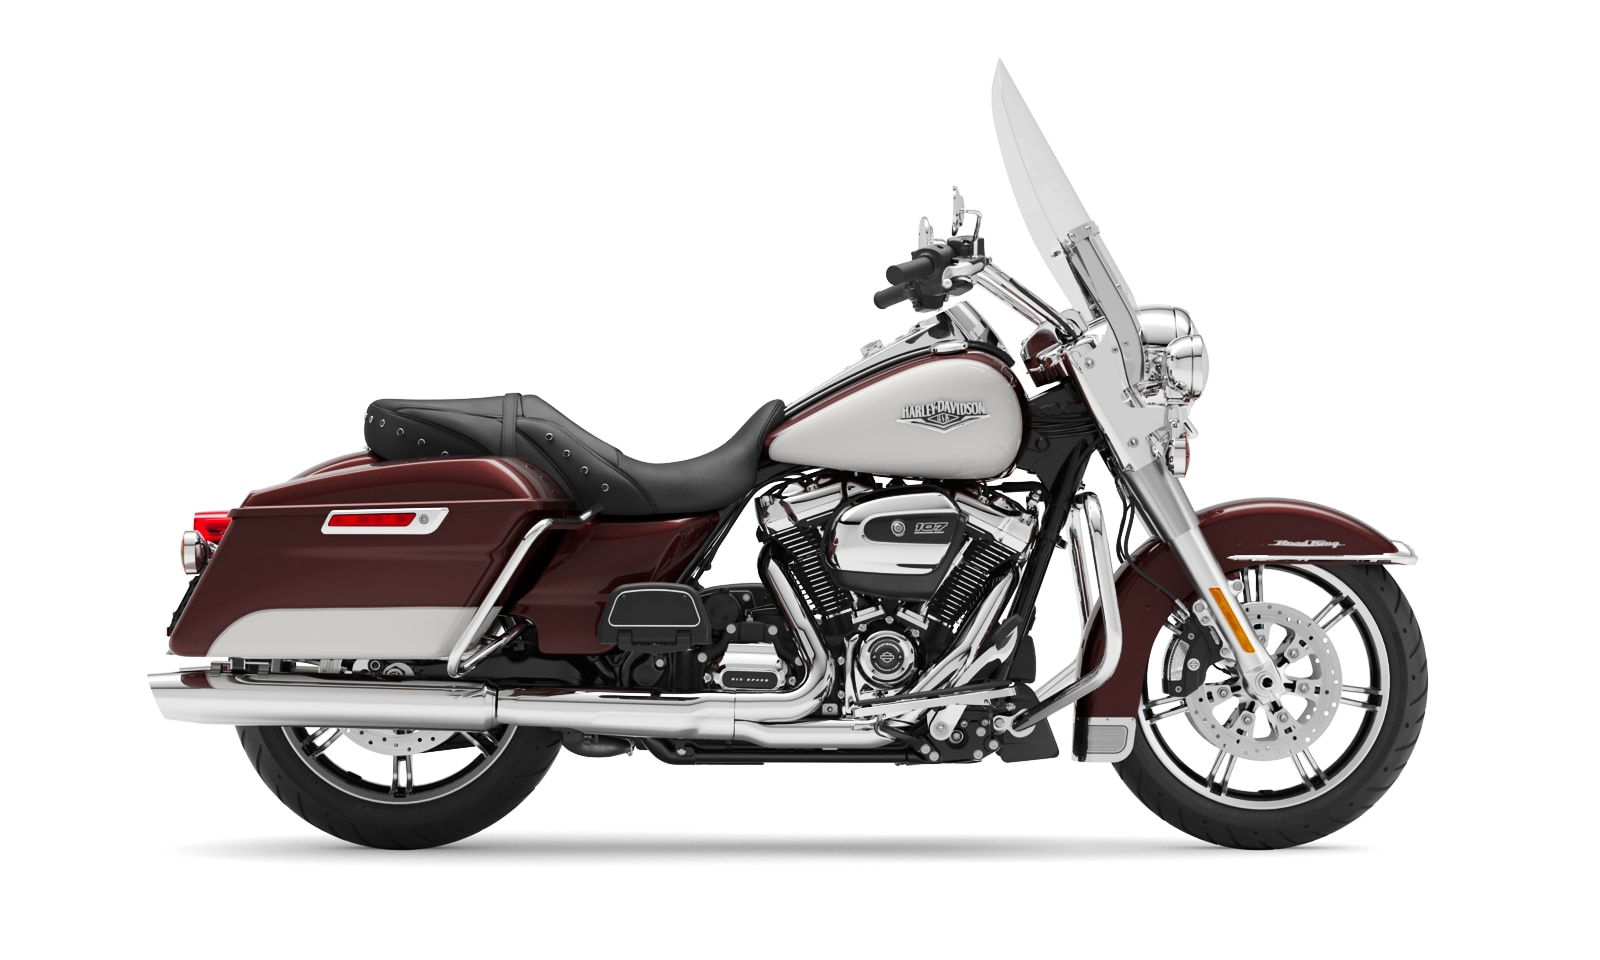 Harley-Davidson Motorcycle Company